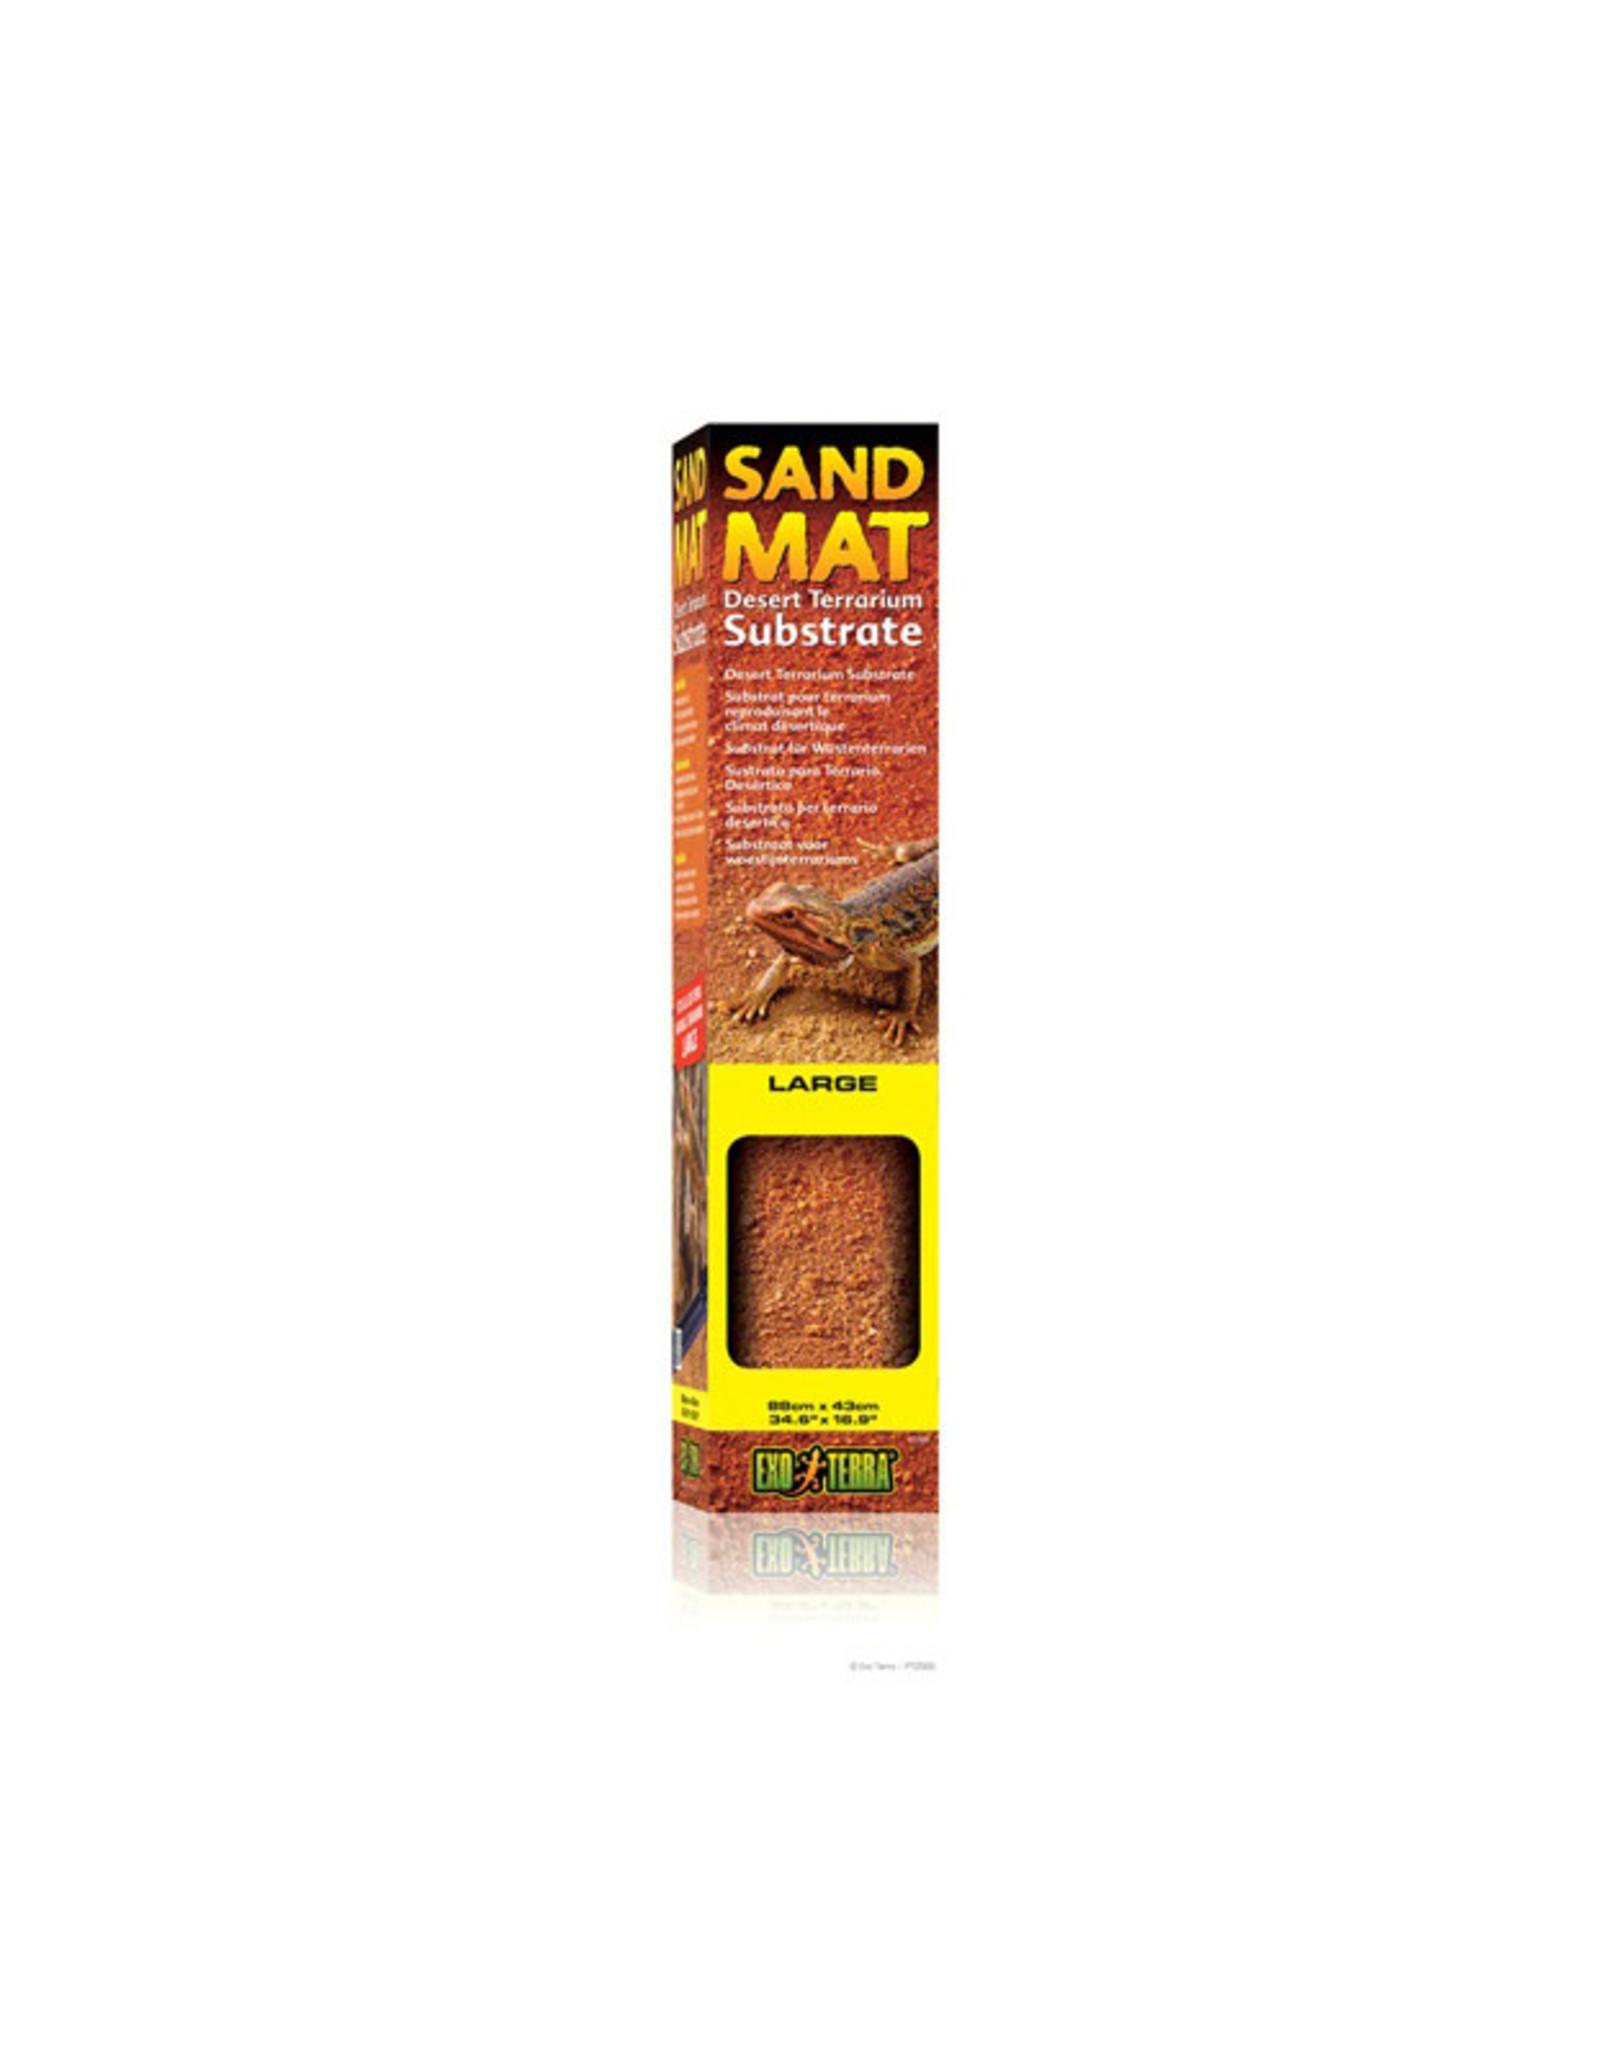 "Exo Terra Sand Mat Large - Desert Terrarium Substrate - 88 cm x 43 cm (24"" x 16"")"